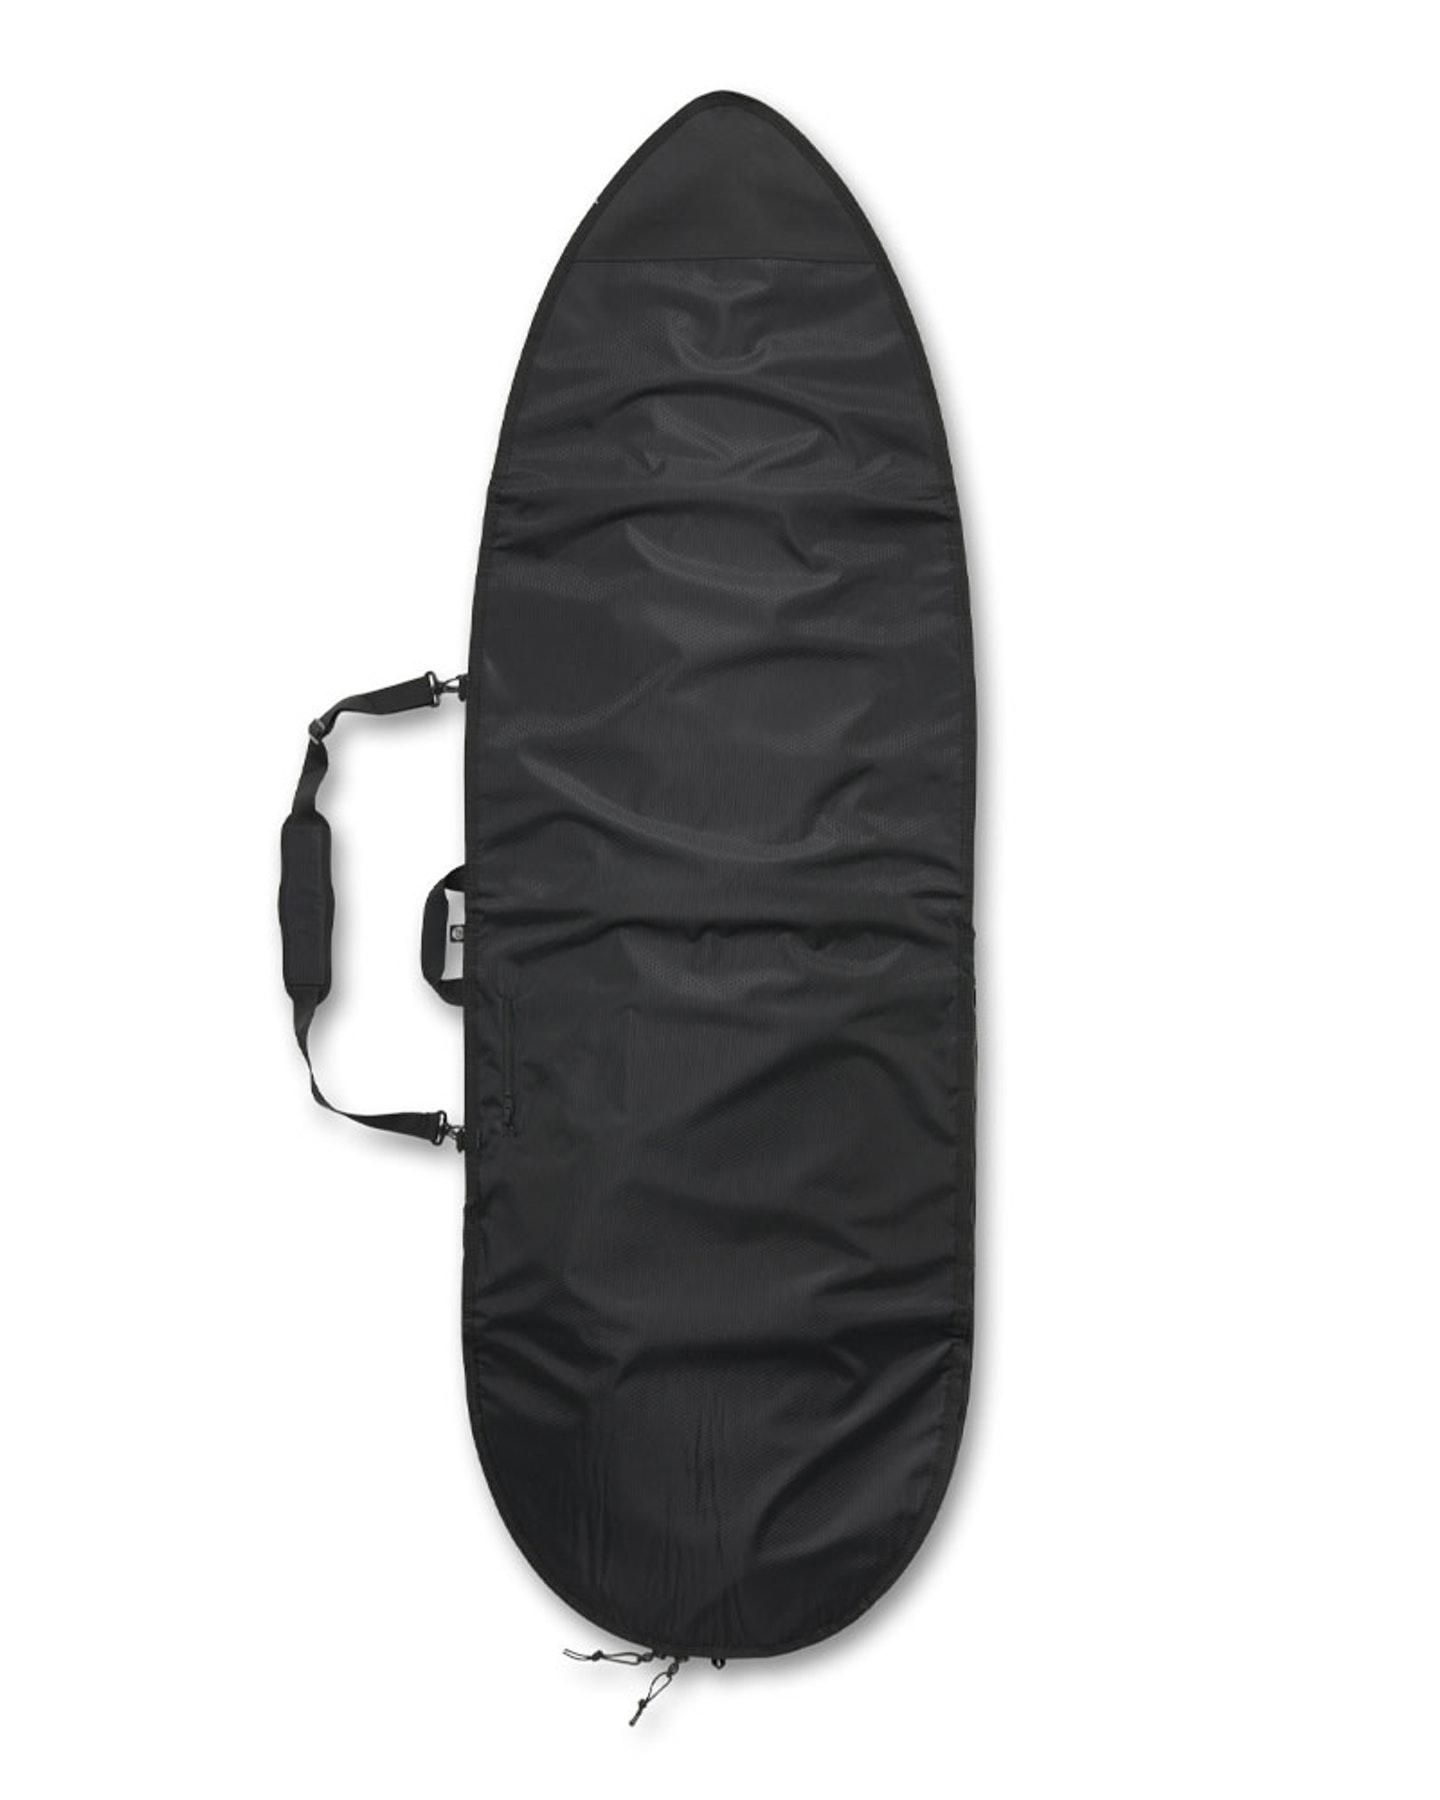 Project Blank Single Wide Shortboard Everyday Travel Bag 6'4 Black